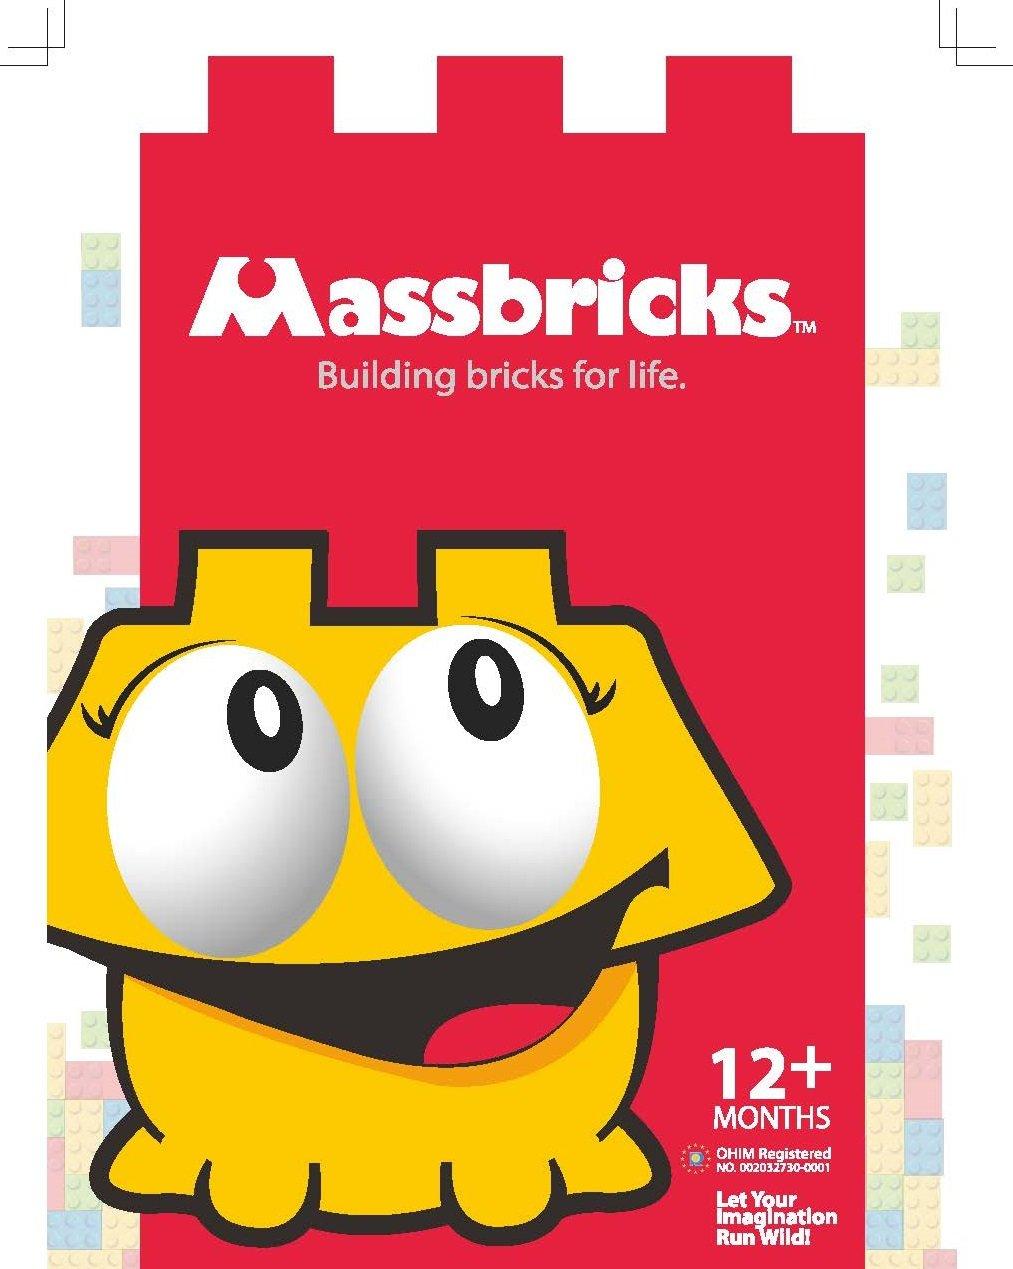 MassBricks Jumbo Plastic Building Blocks - 86 Pieces Giant Toddler Bricks - Kids, Boys, Girls Age 1 - 8 Play Large Educational, Construction, Stacking Toys - BPA Free - Storage bin for Toys